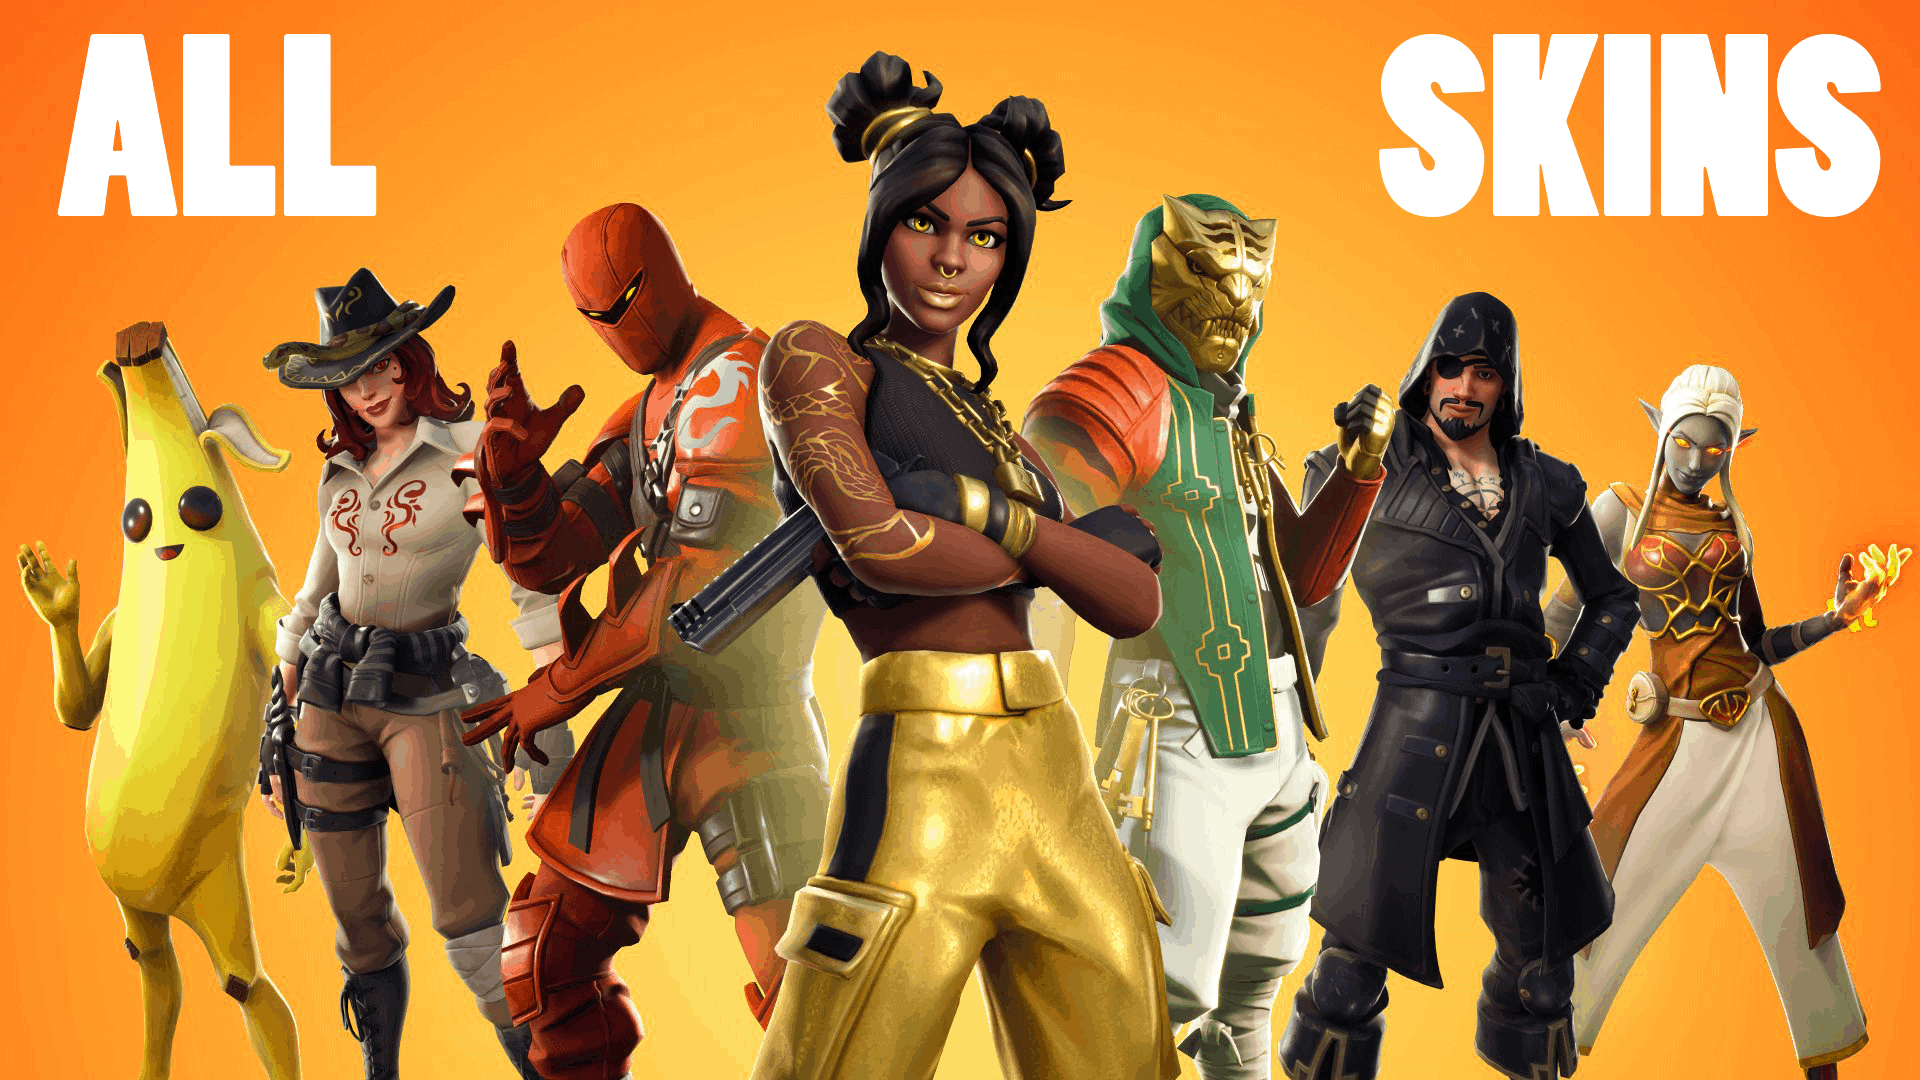 All New Skins & Styles In Fortnite Season 8